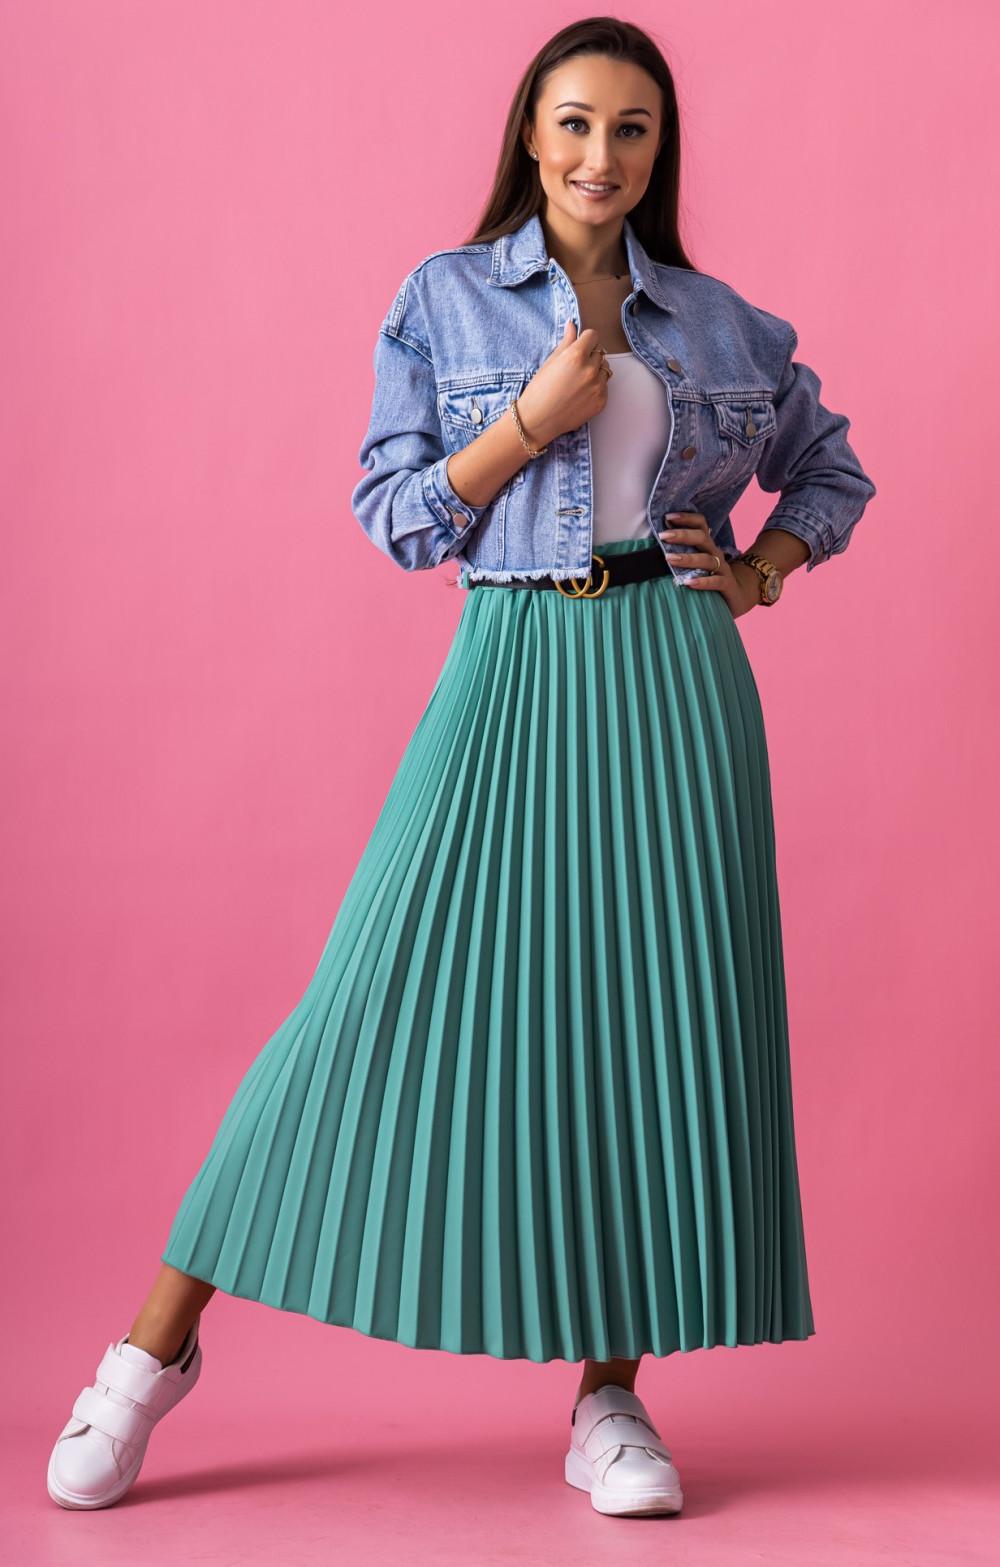 Butelkowo zielona plisowana spódnica midi Kendall 1